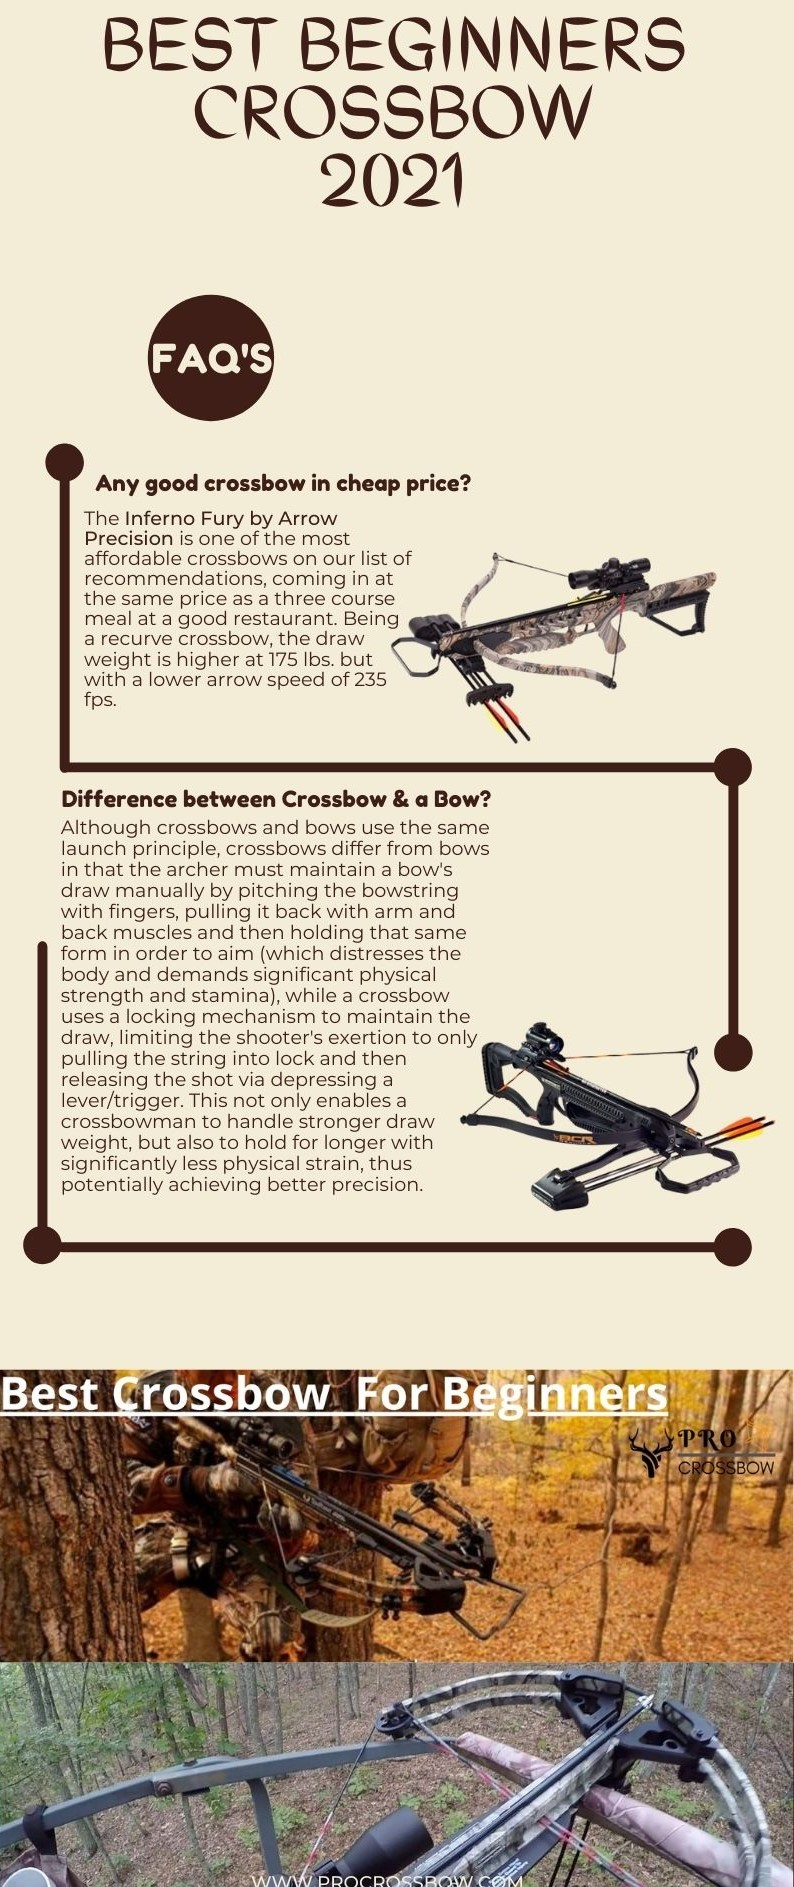 Best beginners crossbow 2021